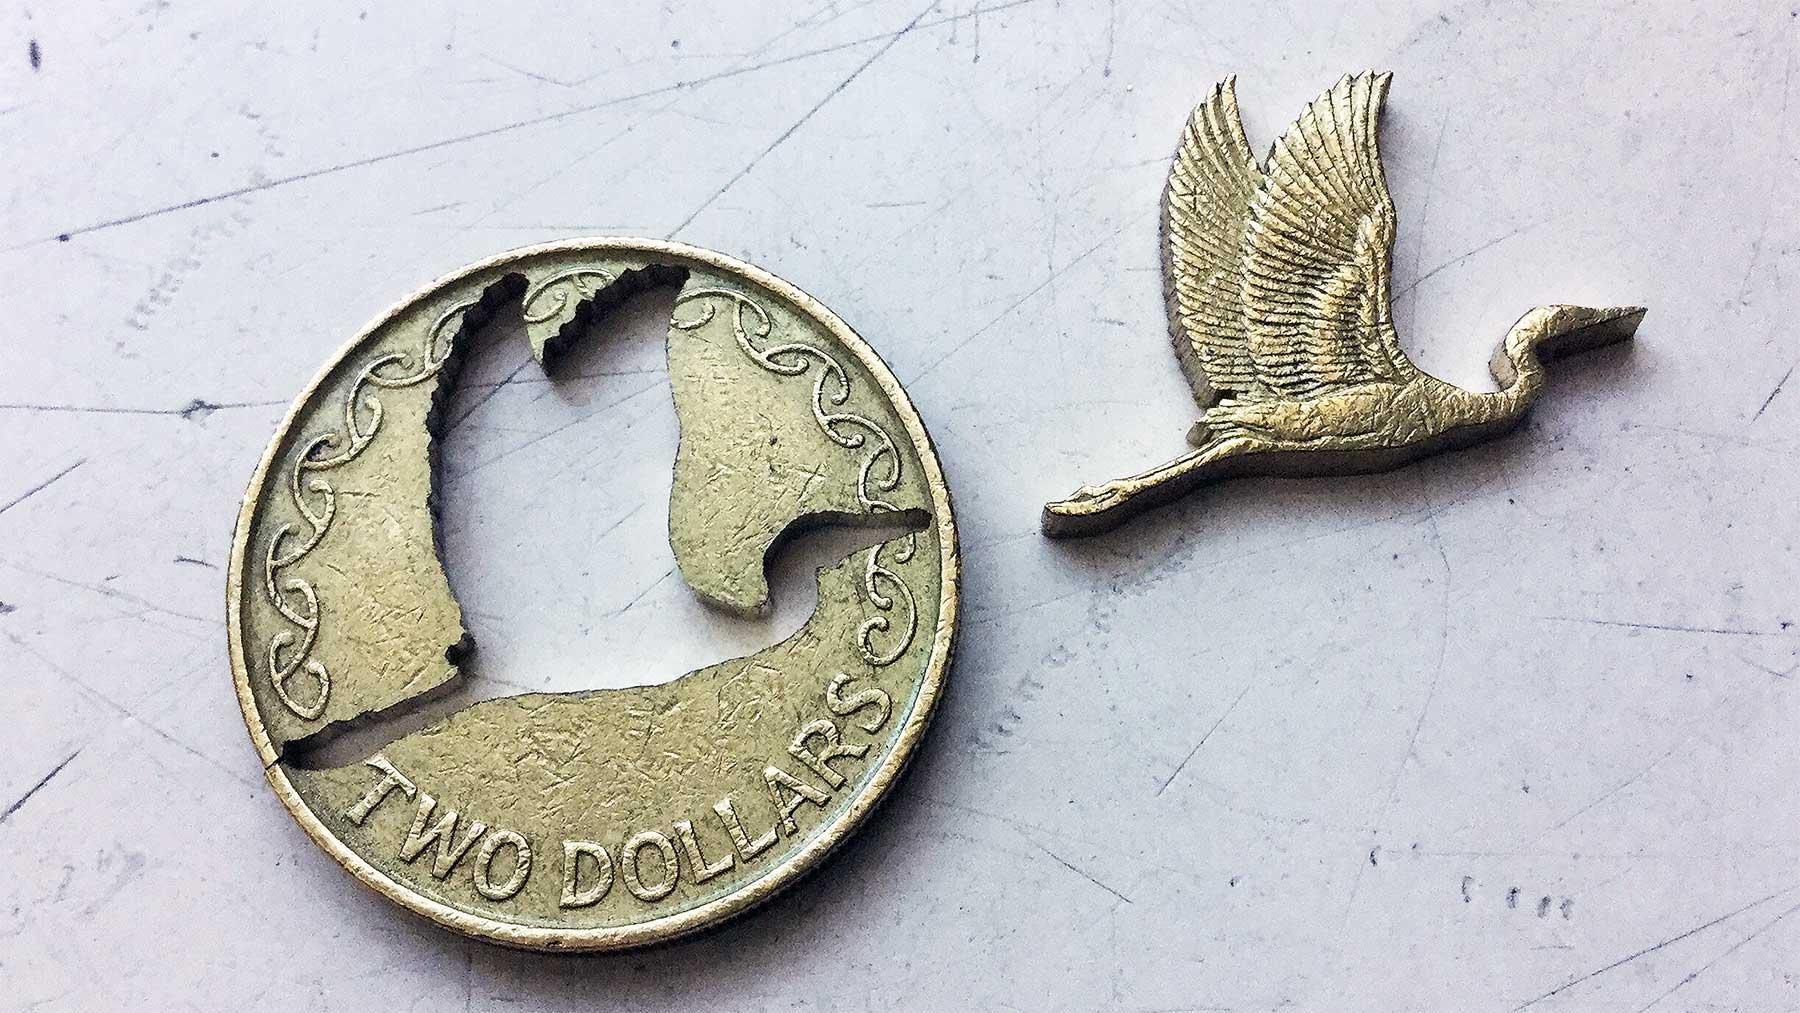 Micah Adams sägt Motive aus Münzen